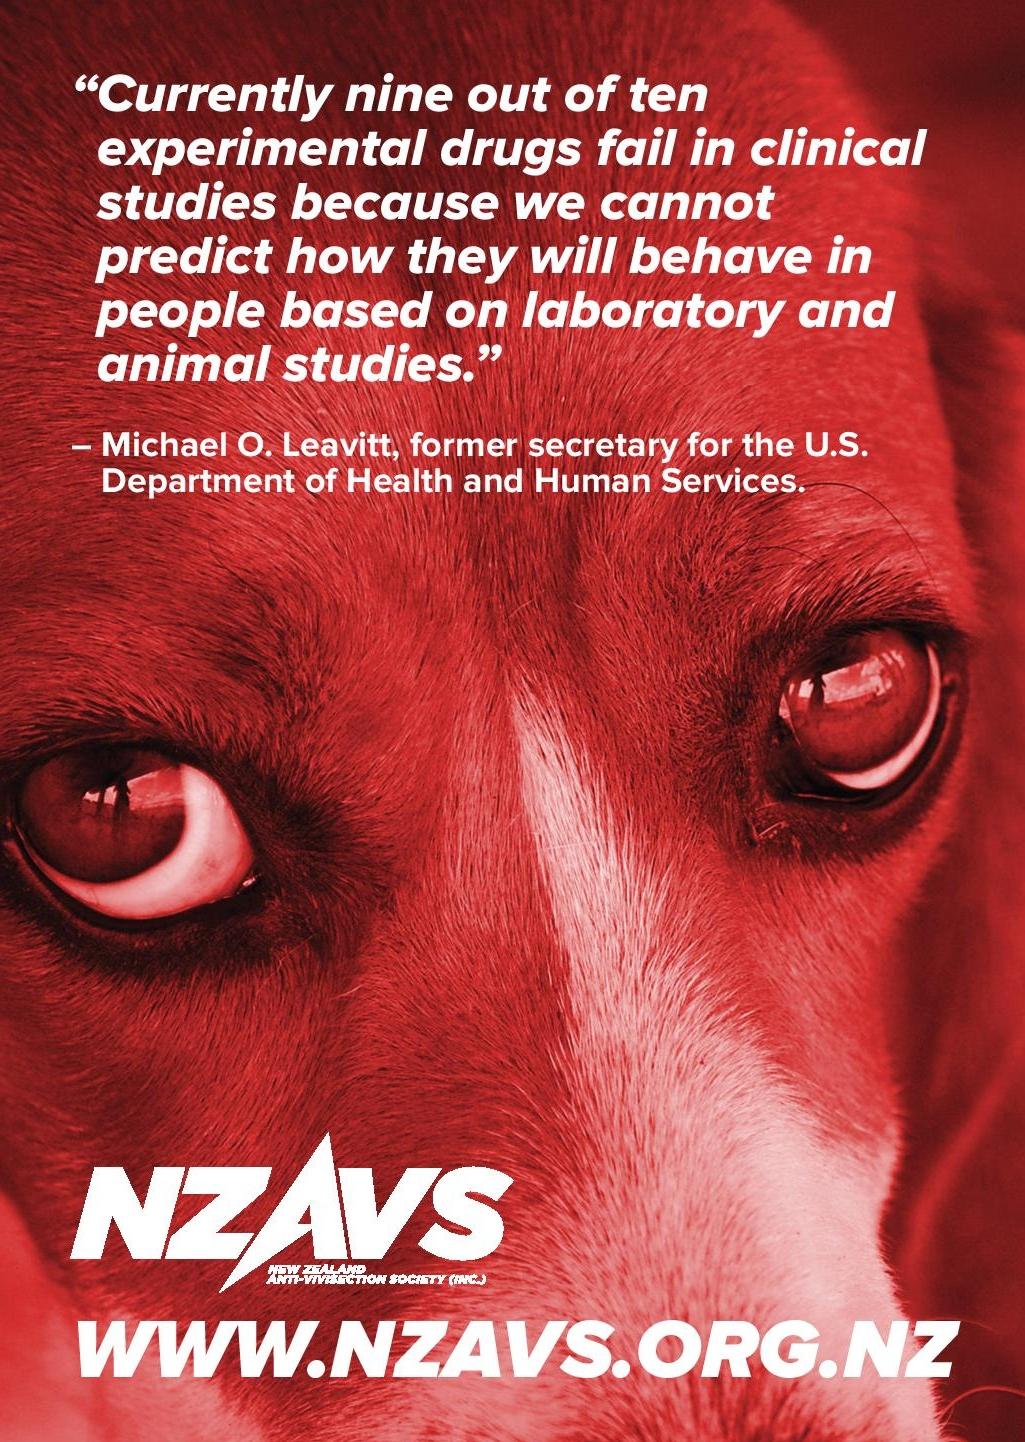 NZAVS_PressAds_3_PRINT- cropped